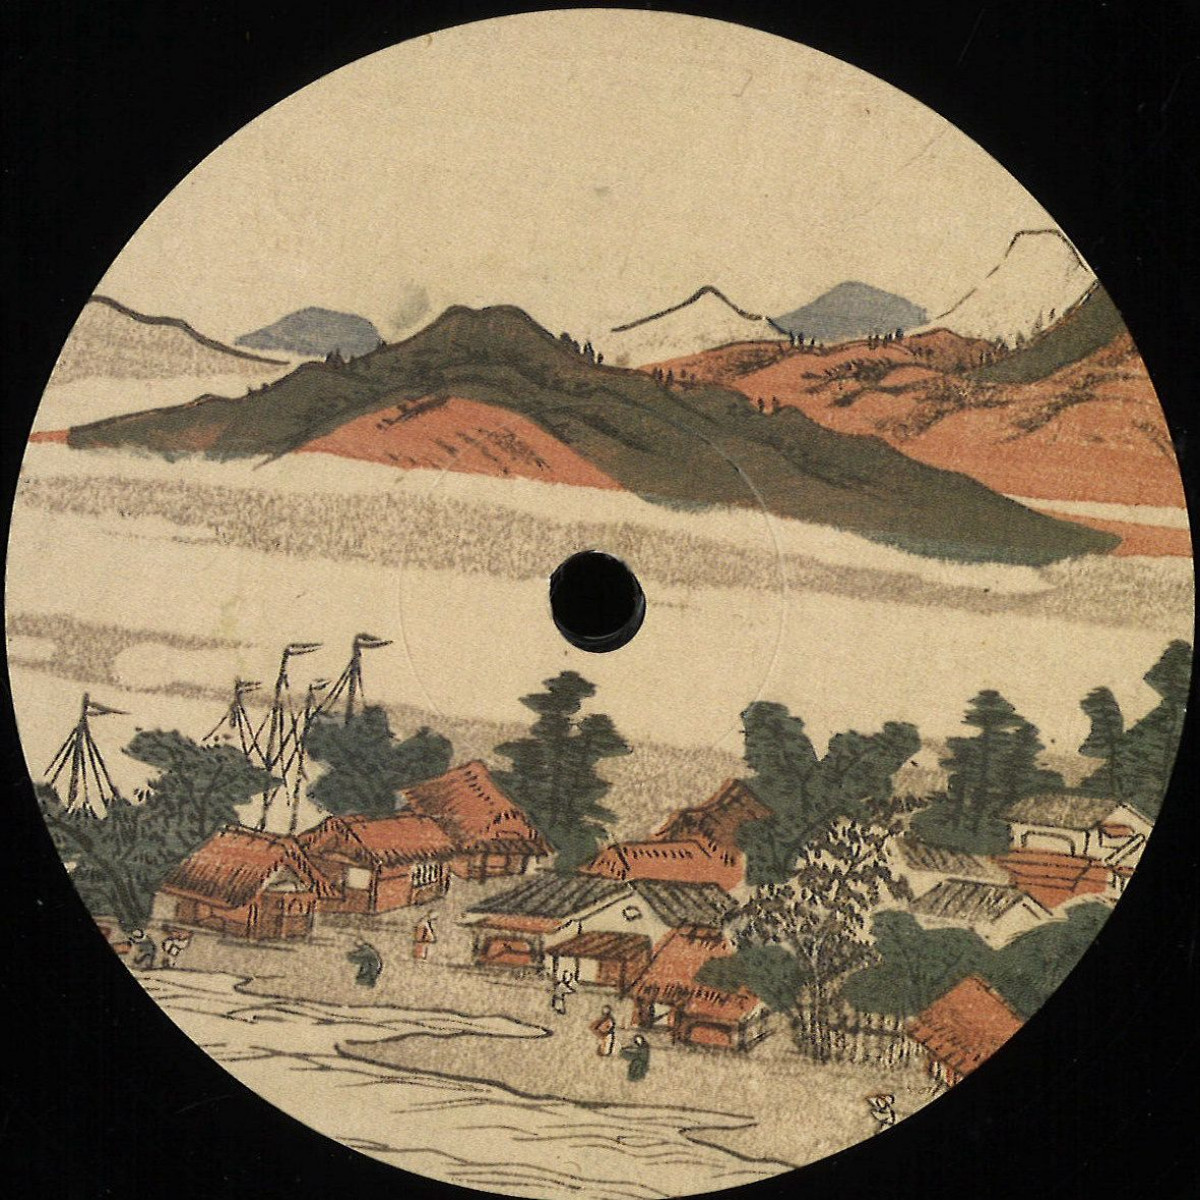 Various Artists - Retro Series Vol. 1 [Ukiyo Music] 01